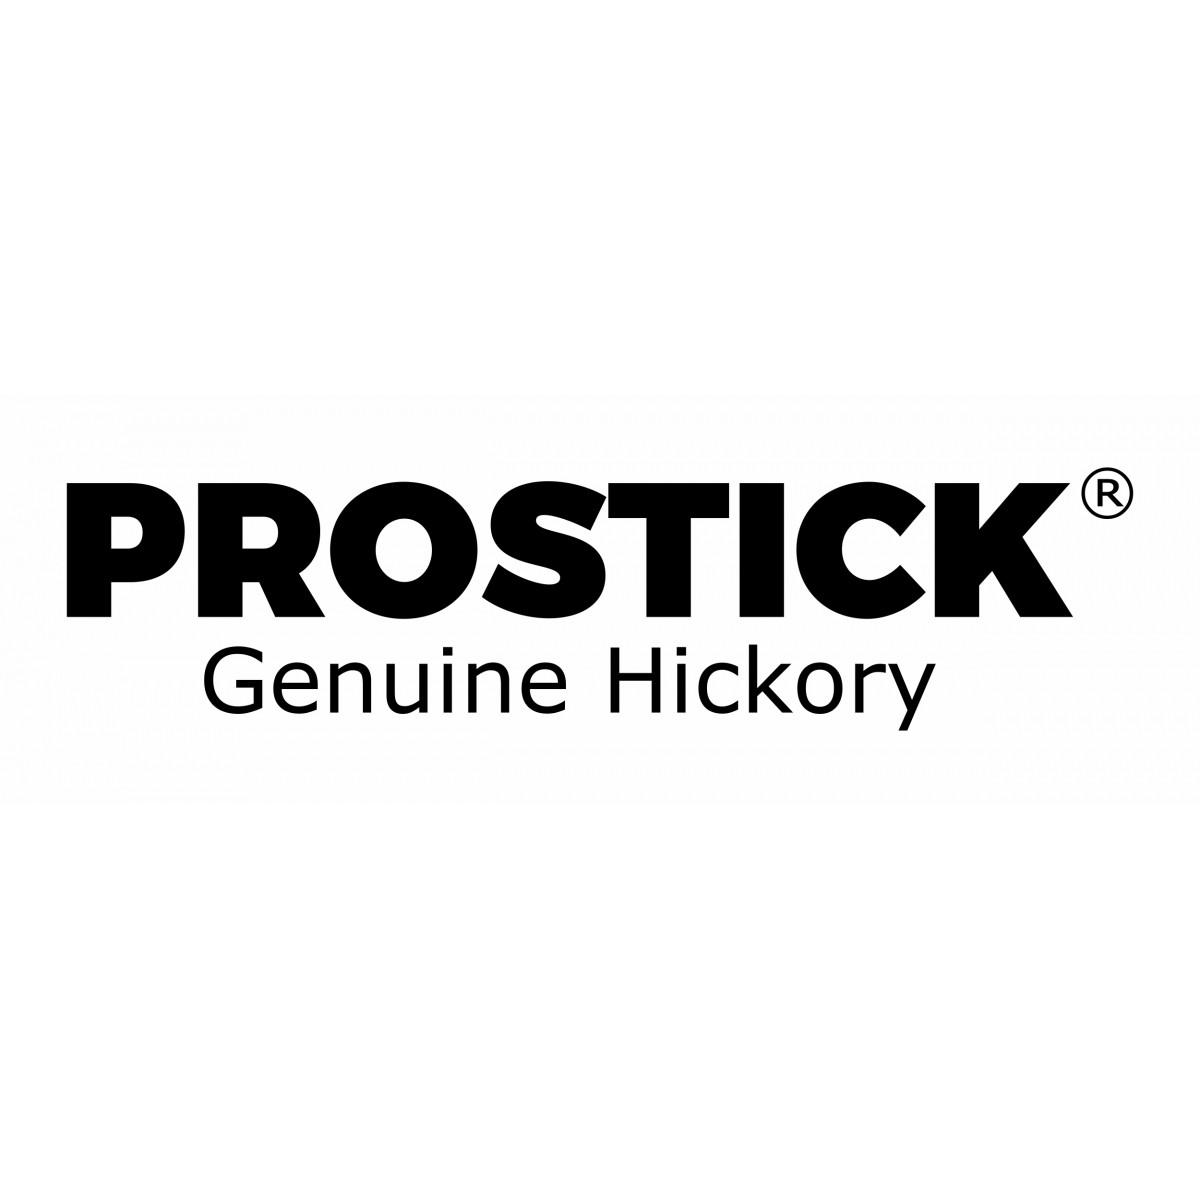 Baqueta Prostick Signature LUFE HY5BTWO Long LF5B